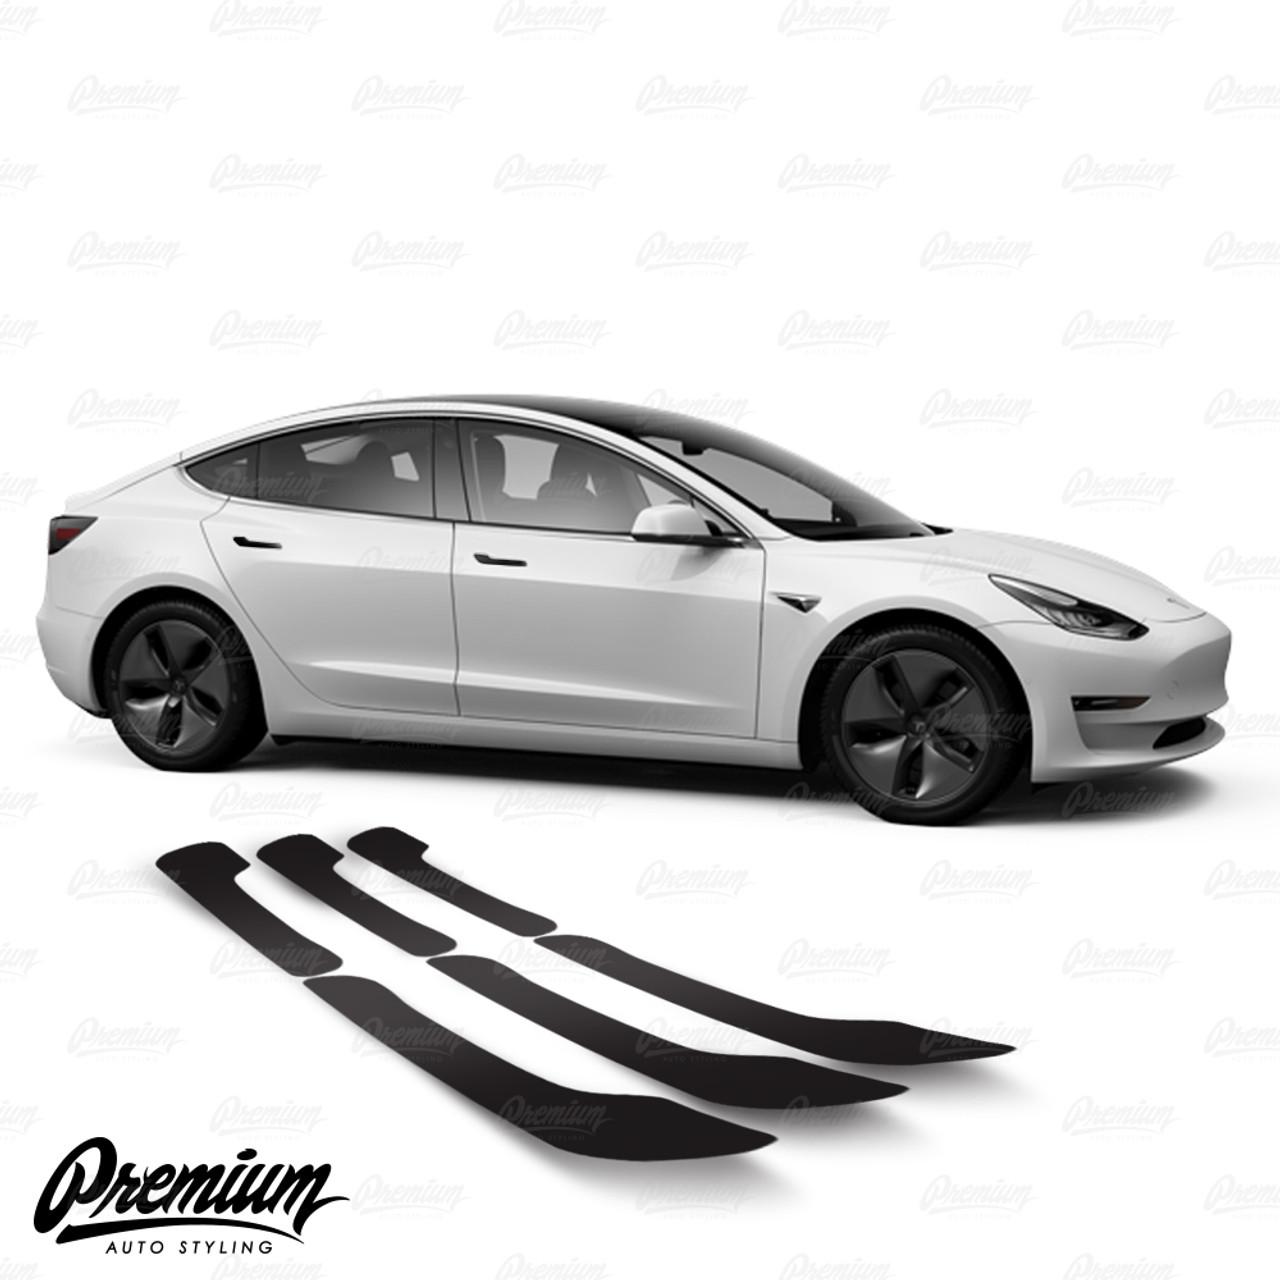 Flat Matte 4 Pcs Door Handle Overlay Chrome Delete Vinyl Kit Fit Tesla Model 3